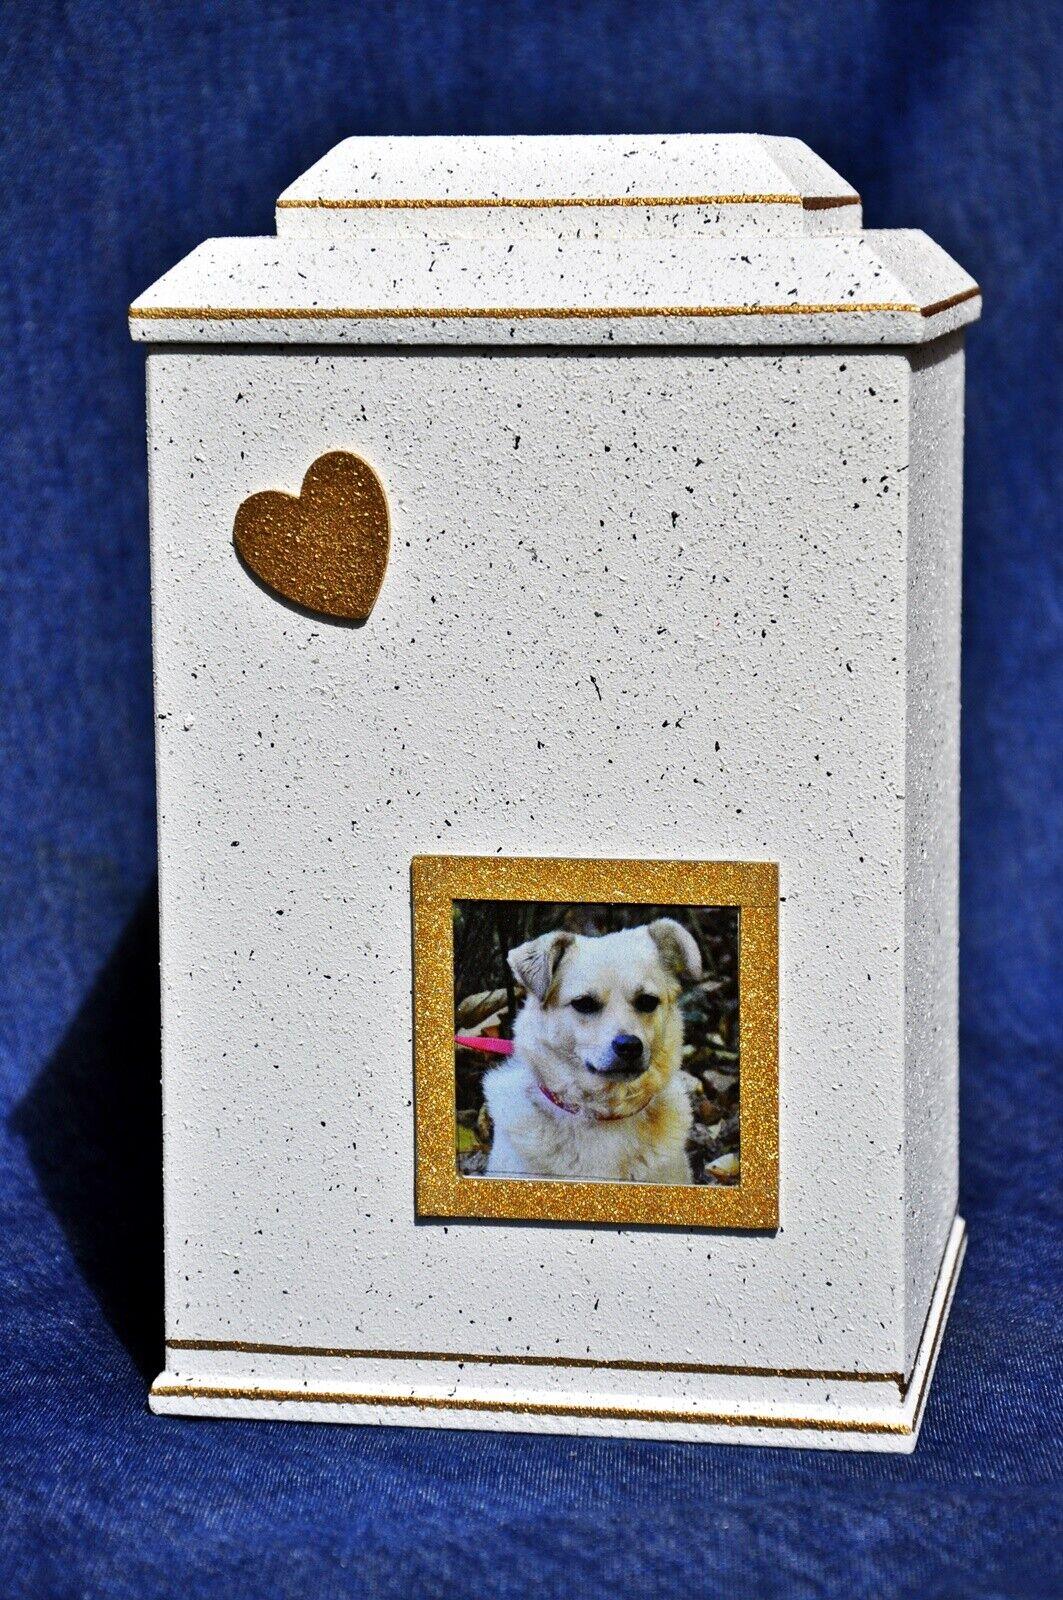 Tierurne, Hundeurne 2,3 Liter Inhalt,Granit-Optik,exclusiv